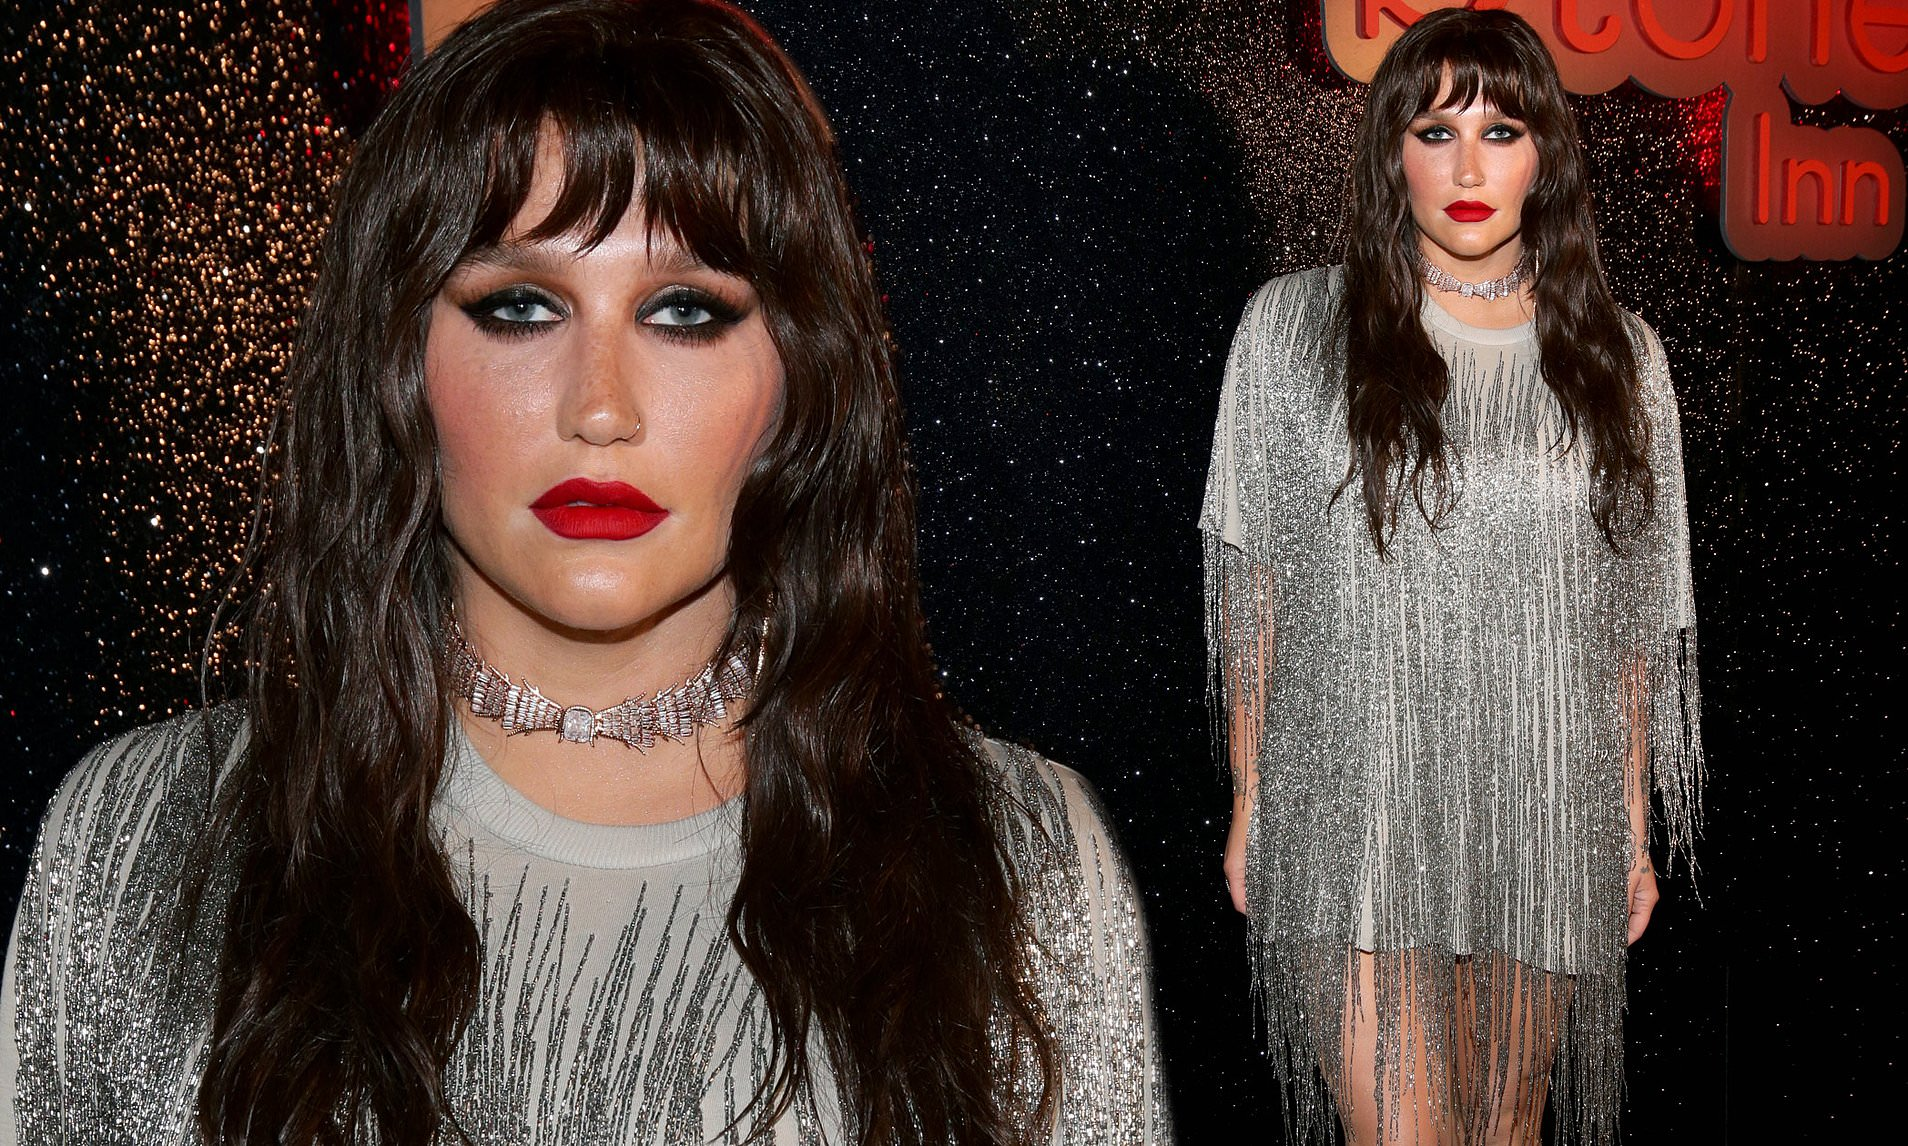 Kesha Goes BRUNETTE, Looks Completely Unrecognizable!